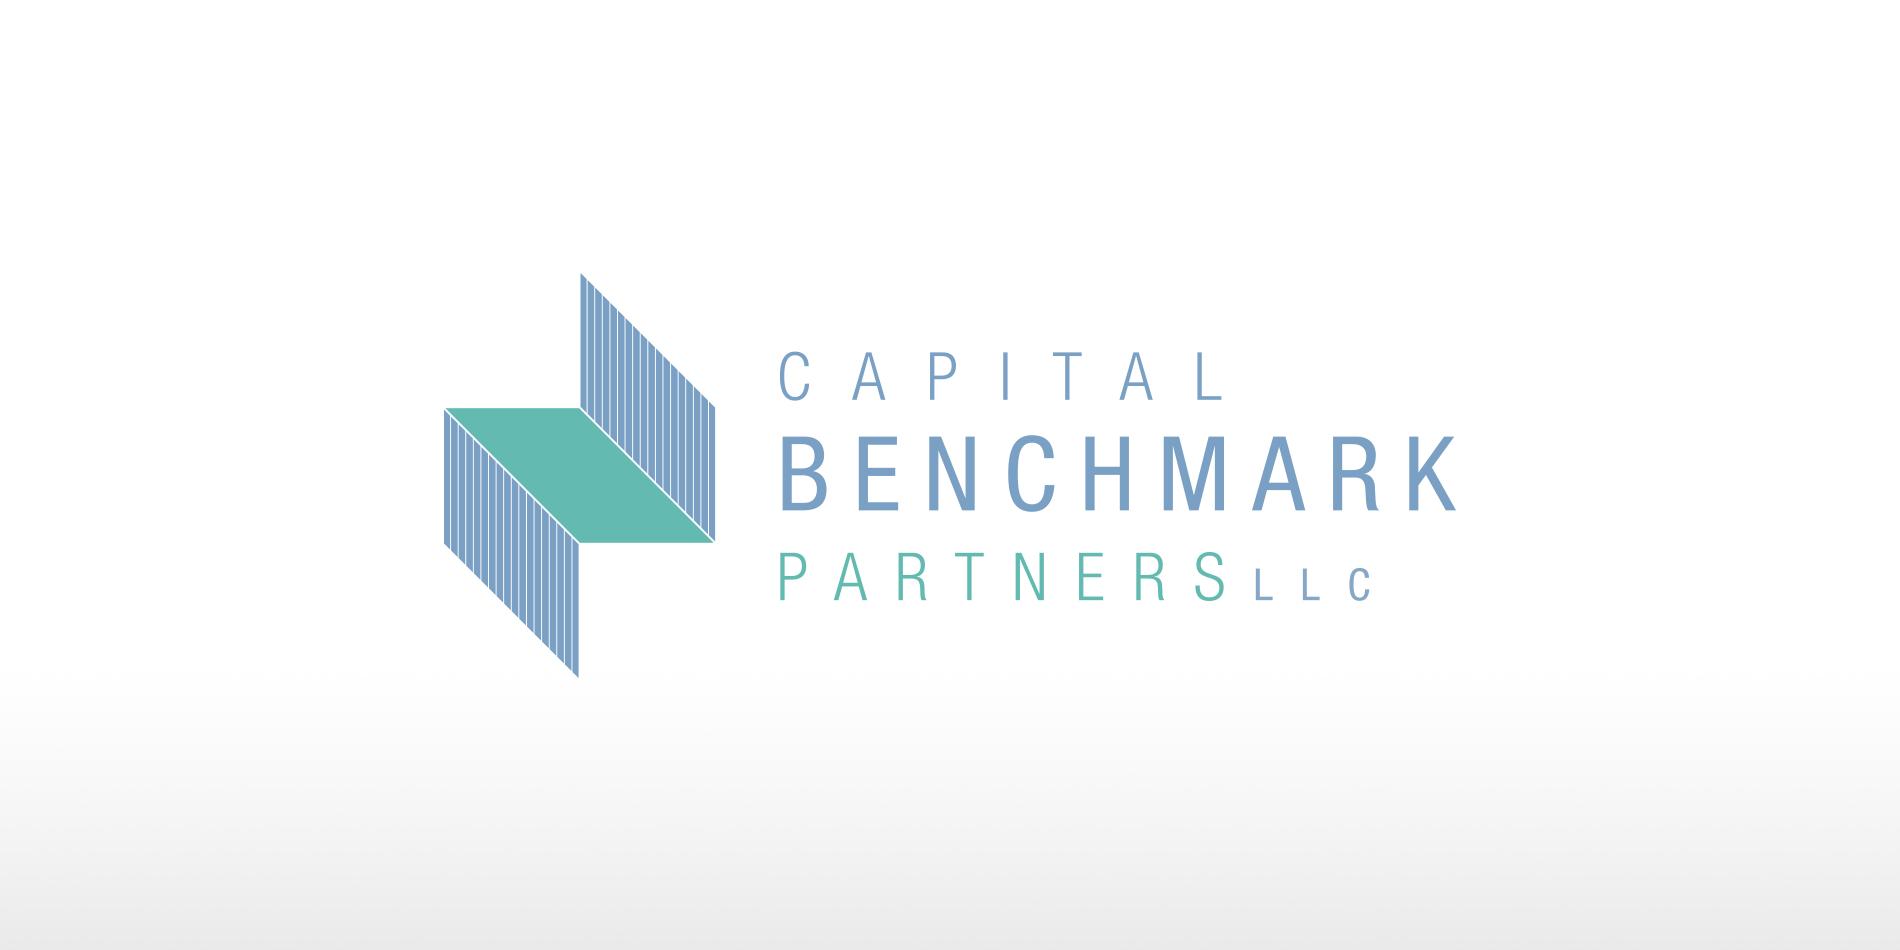 capital benchmark partners abbott designs